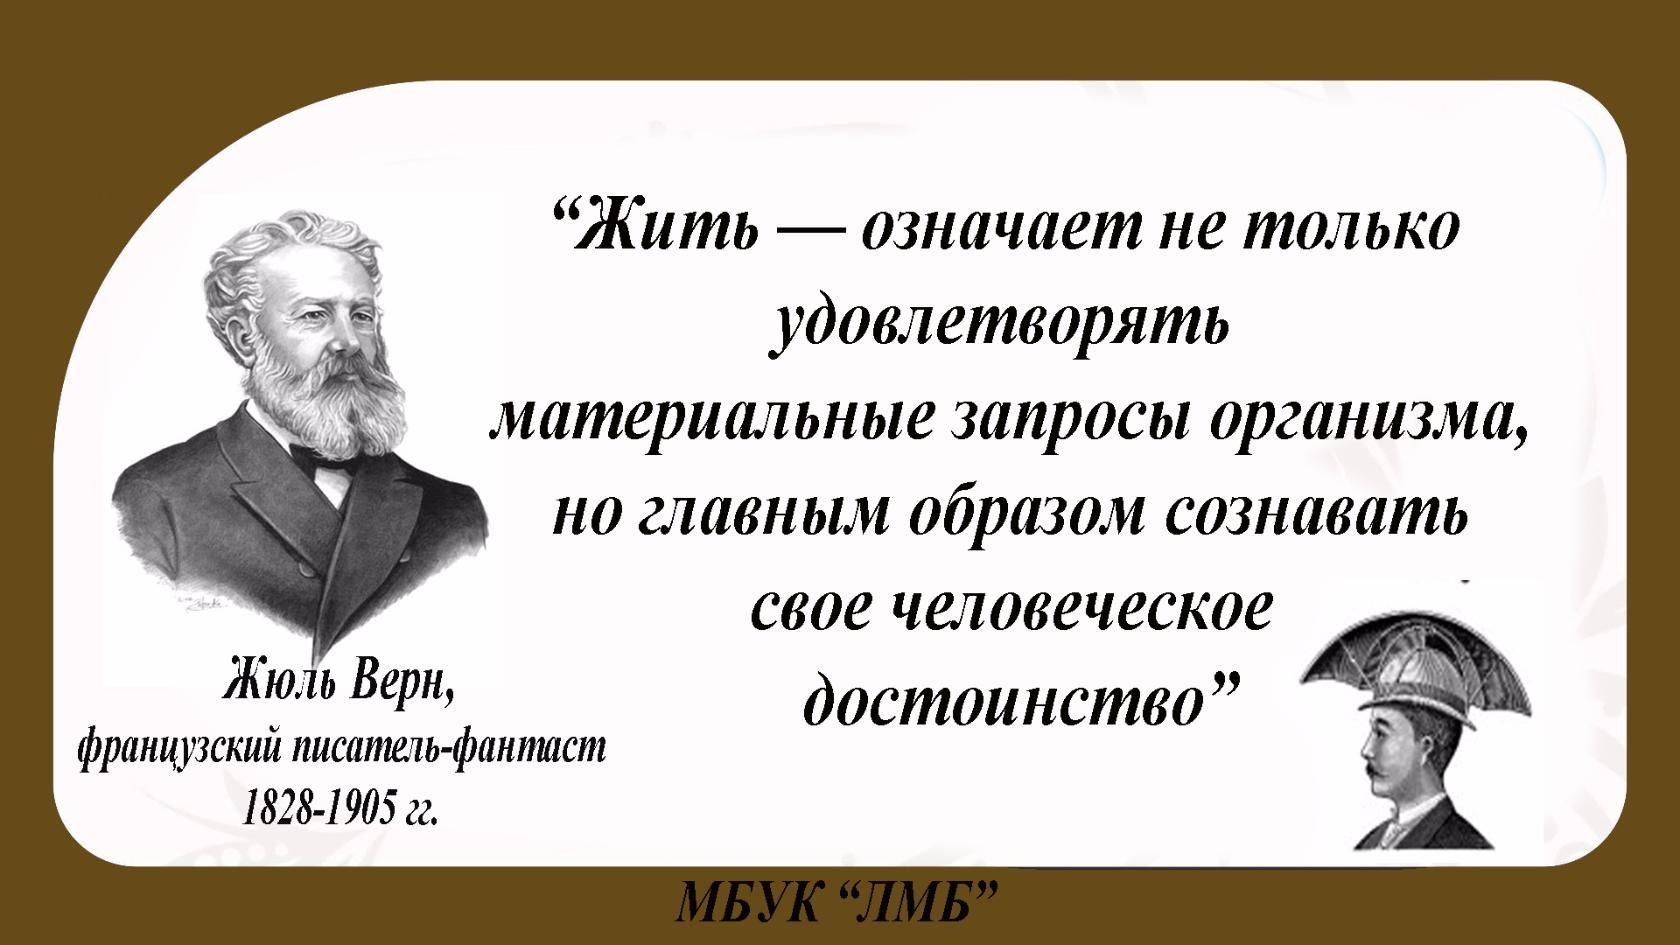 http://bibl-len.ucoz.ru/litr_setpan/aforizm/zhjul_vern-5.jpeg